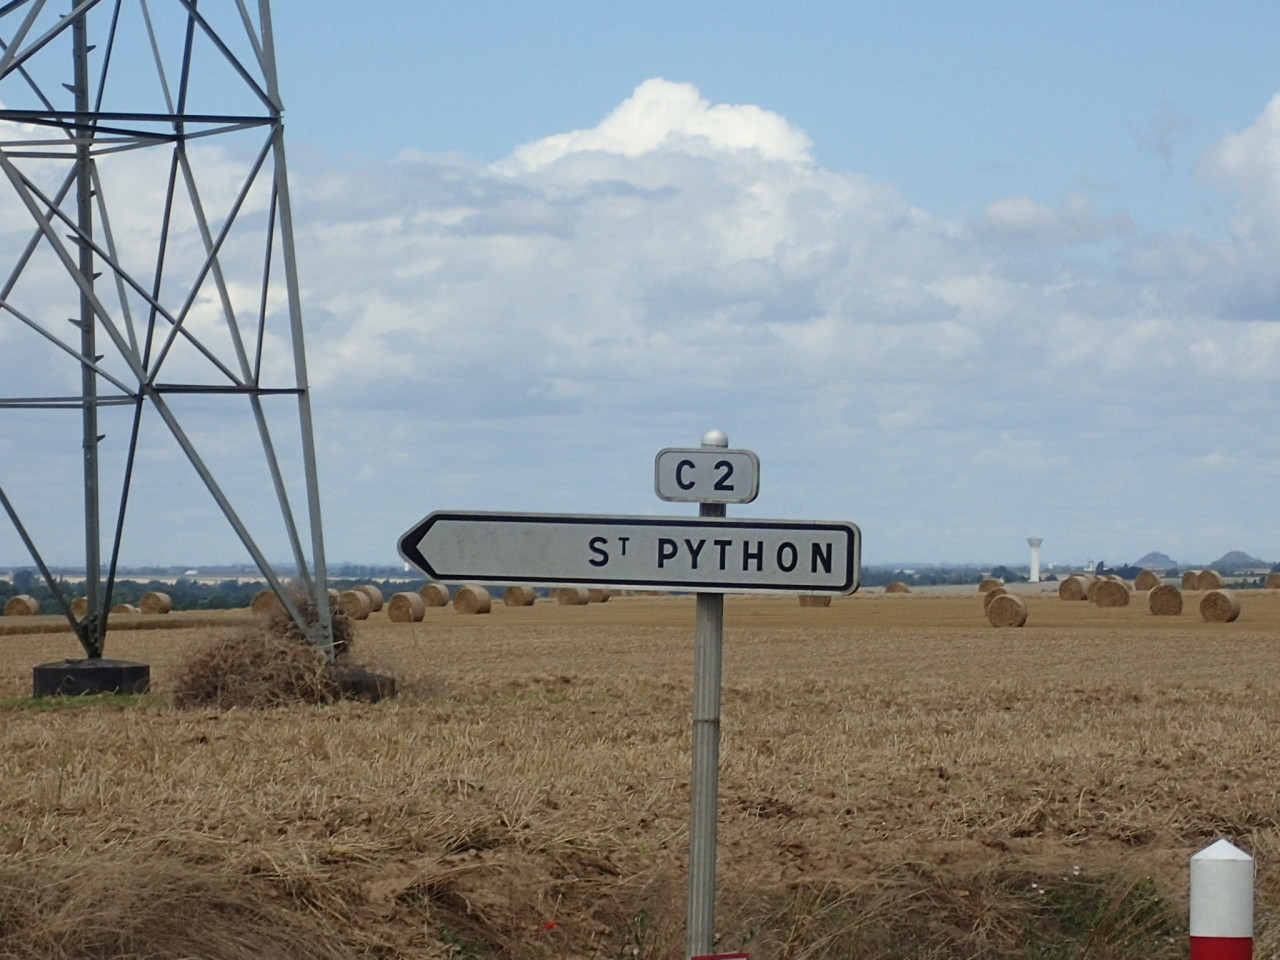 St Python